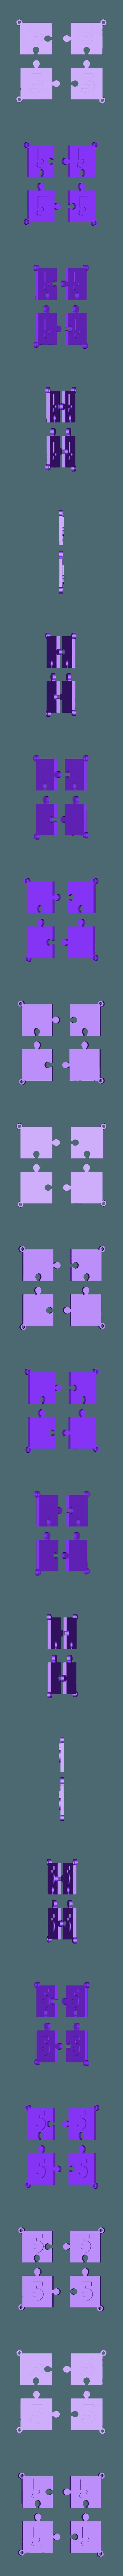 puzzle 5.stl Download STL file puzzle key ring • 3D printing design, catf3d